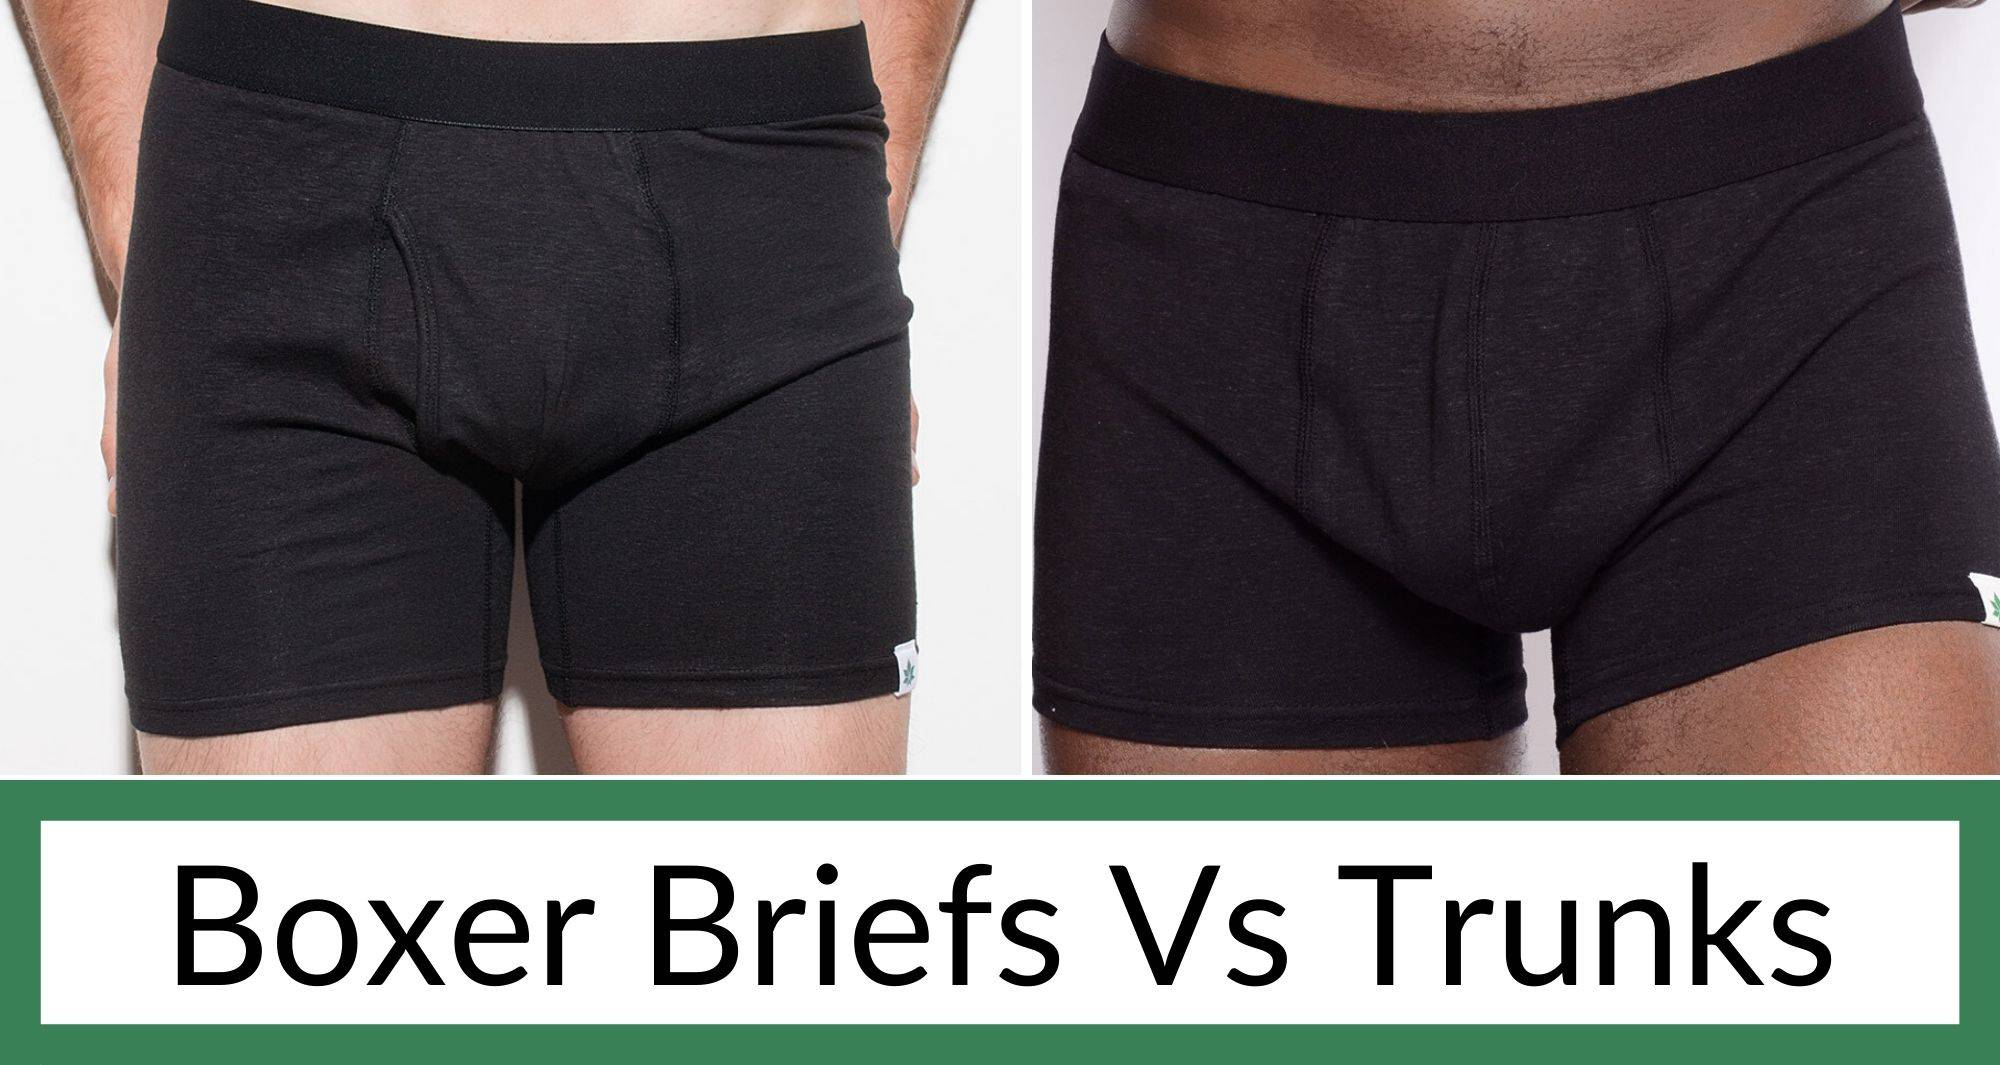 Men wearing boxer briefs and trunks by WAMA Underwear